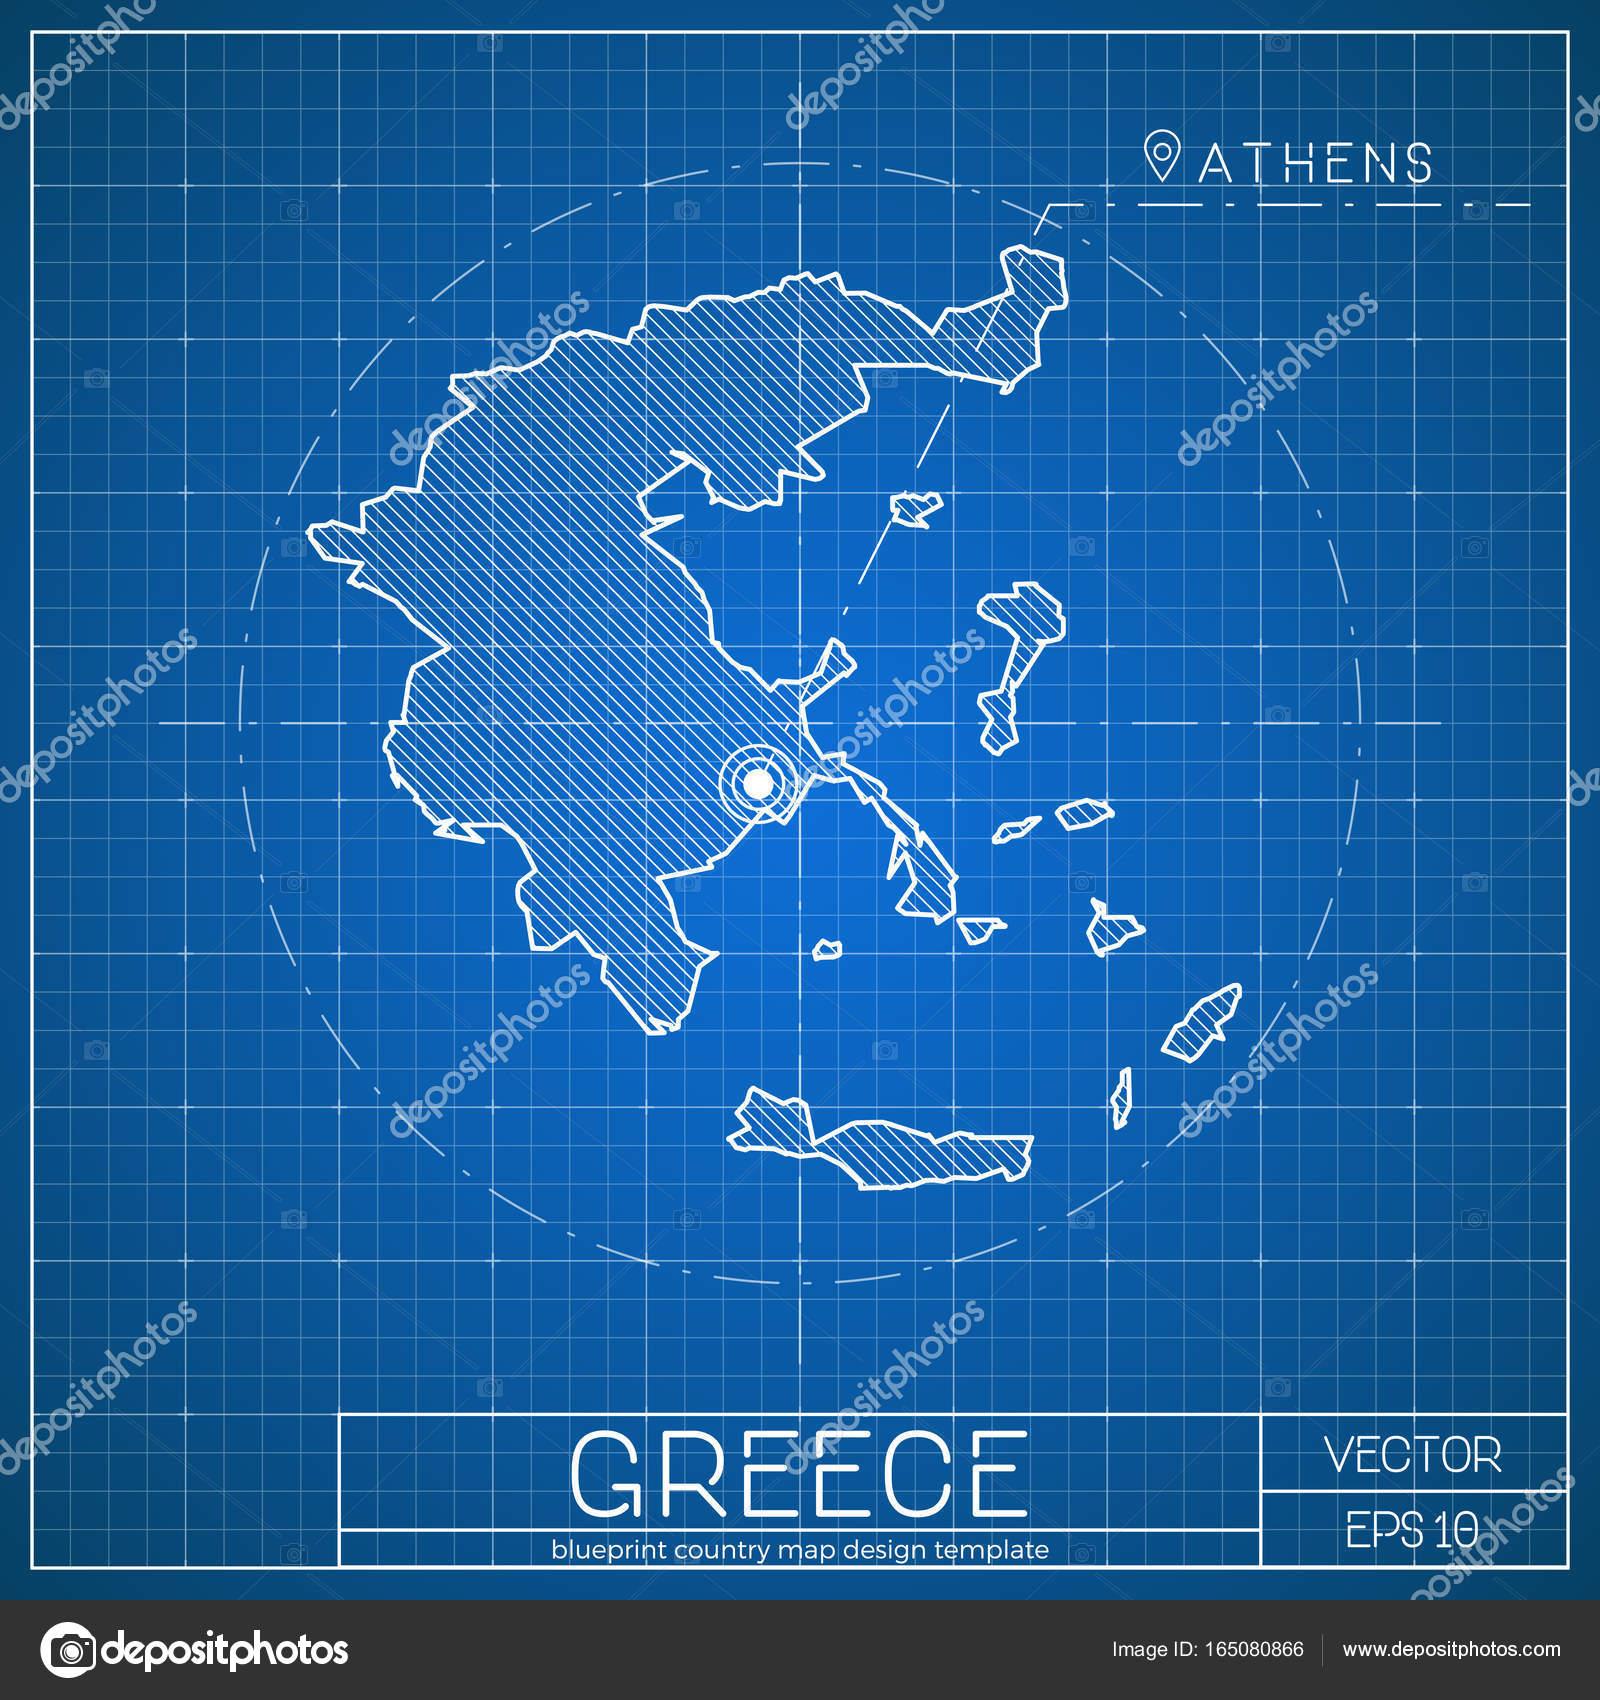 greek template